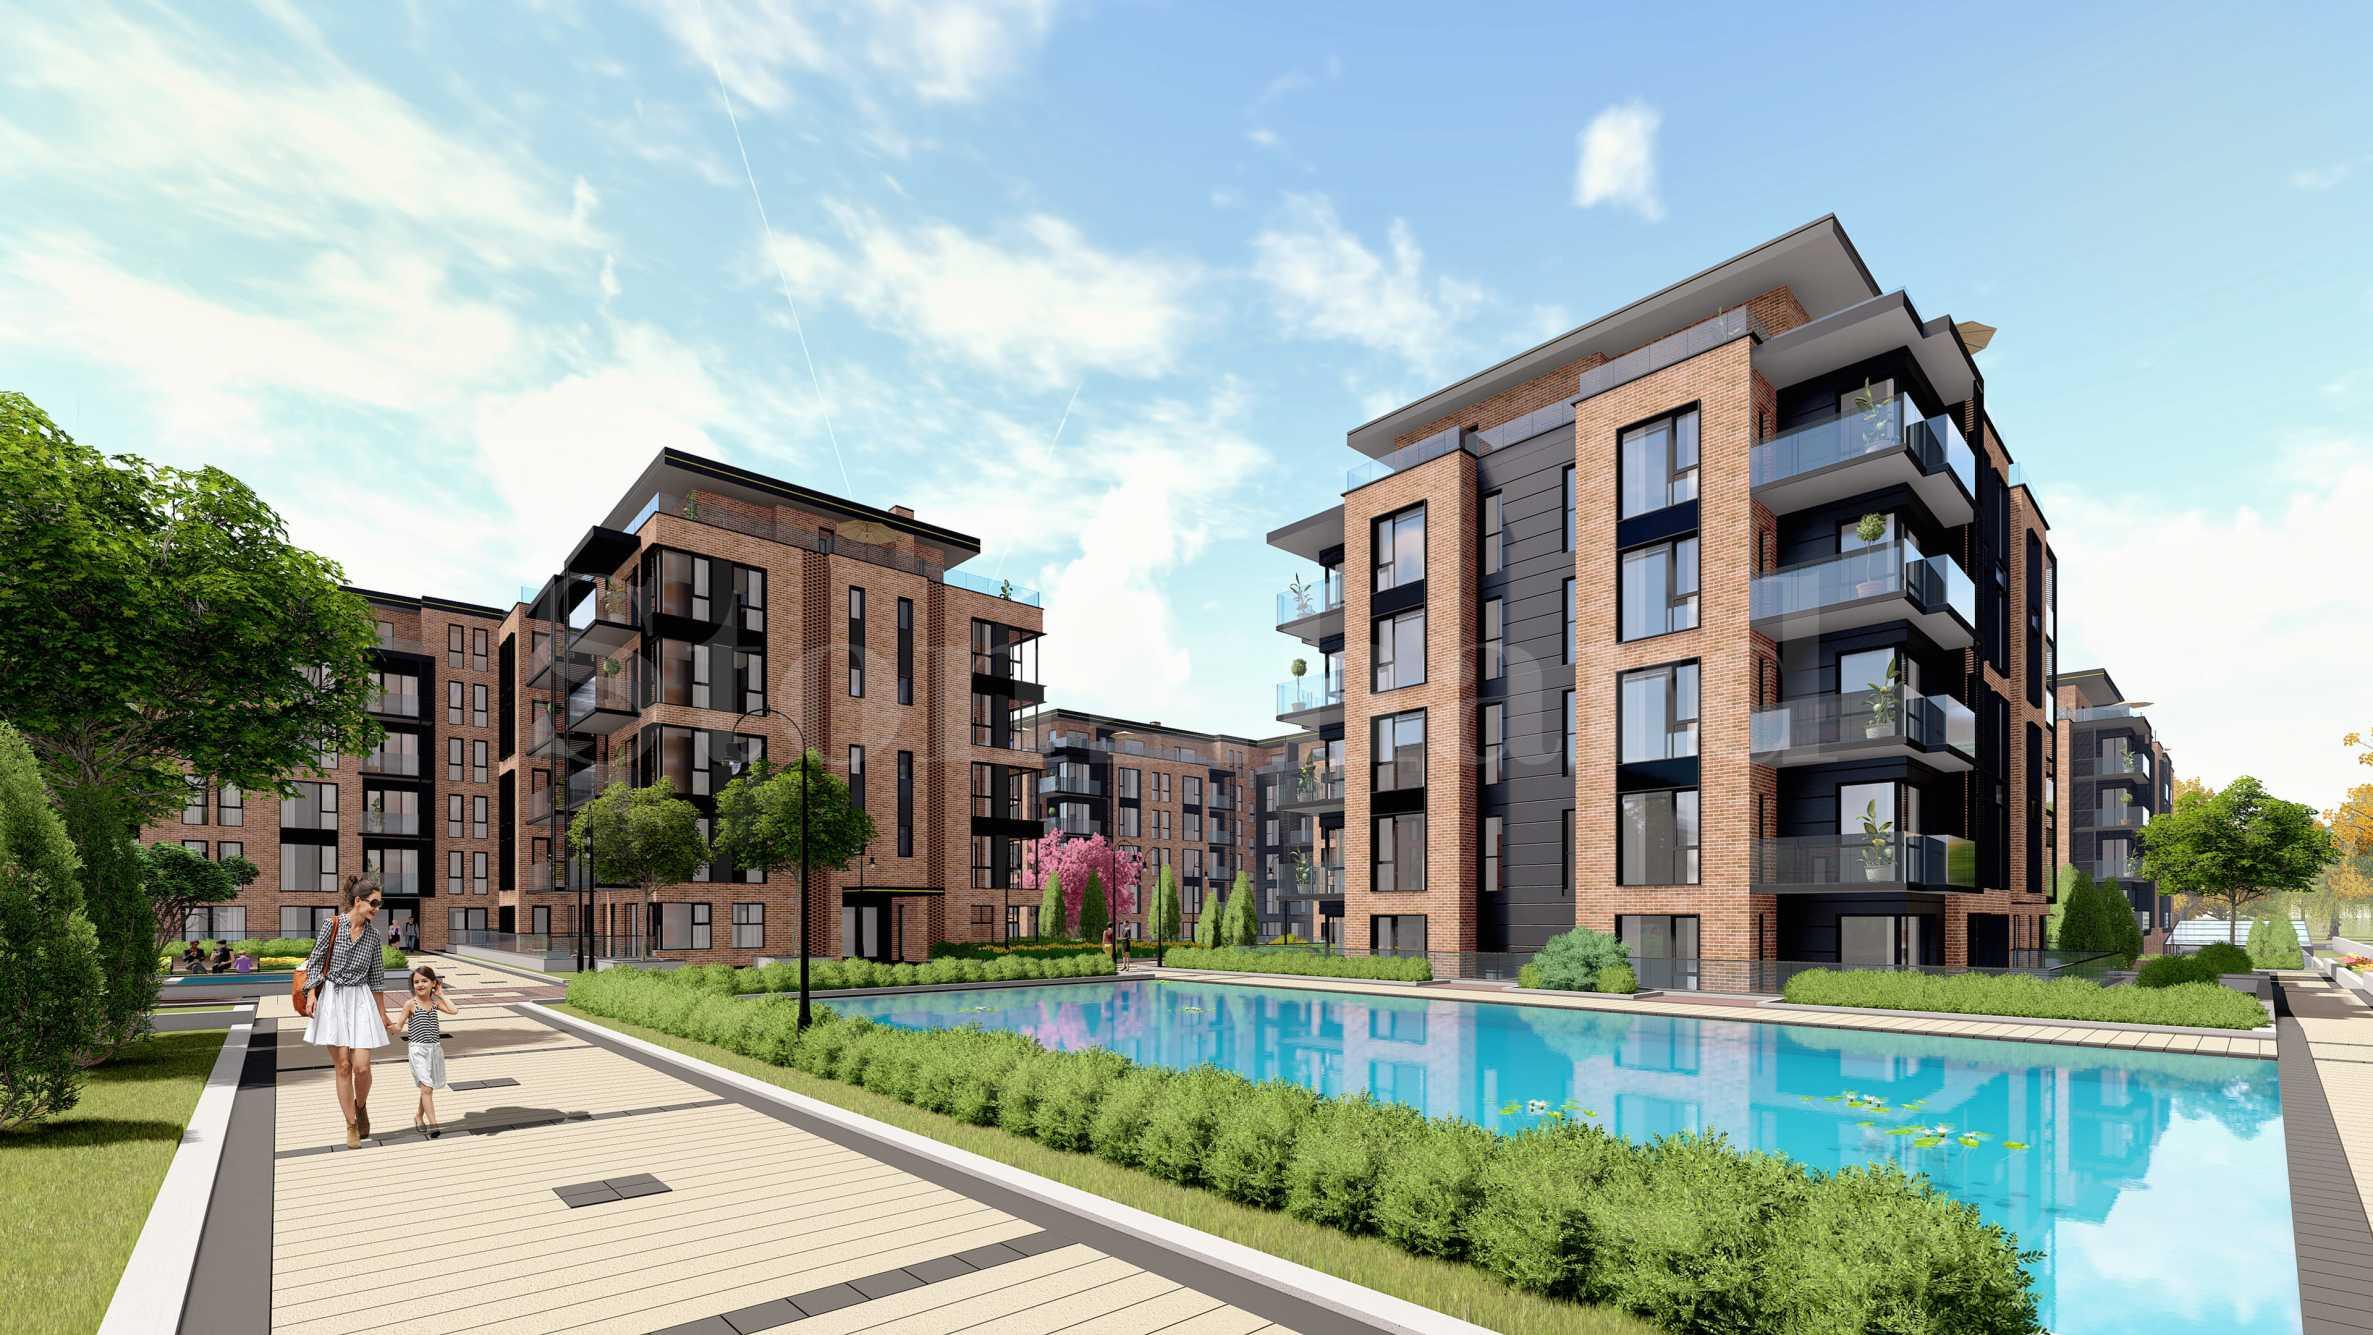 SoHome Residential Park - 10 жилищни сгради в Ловния парк на Борисова градина1 - Stonehard